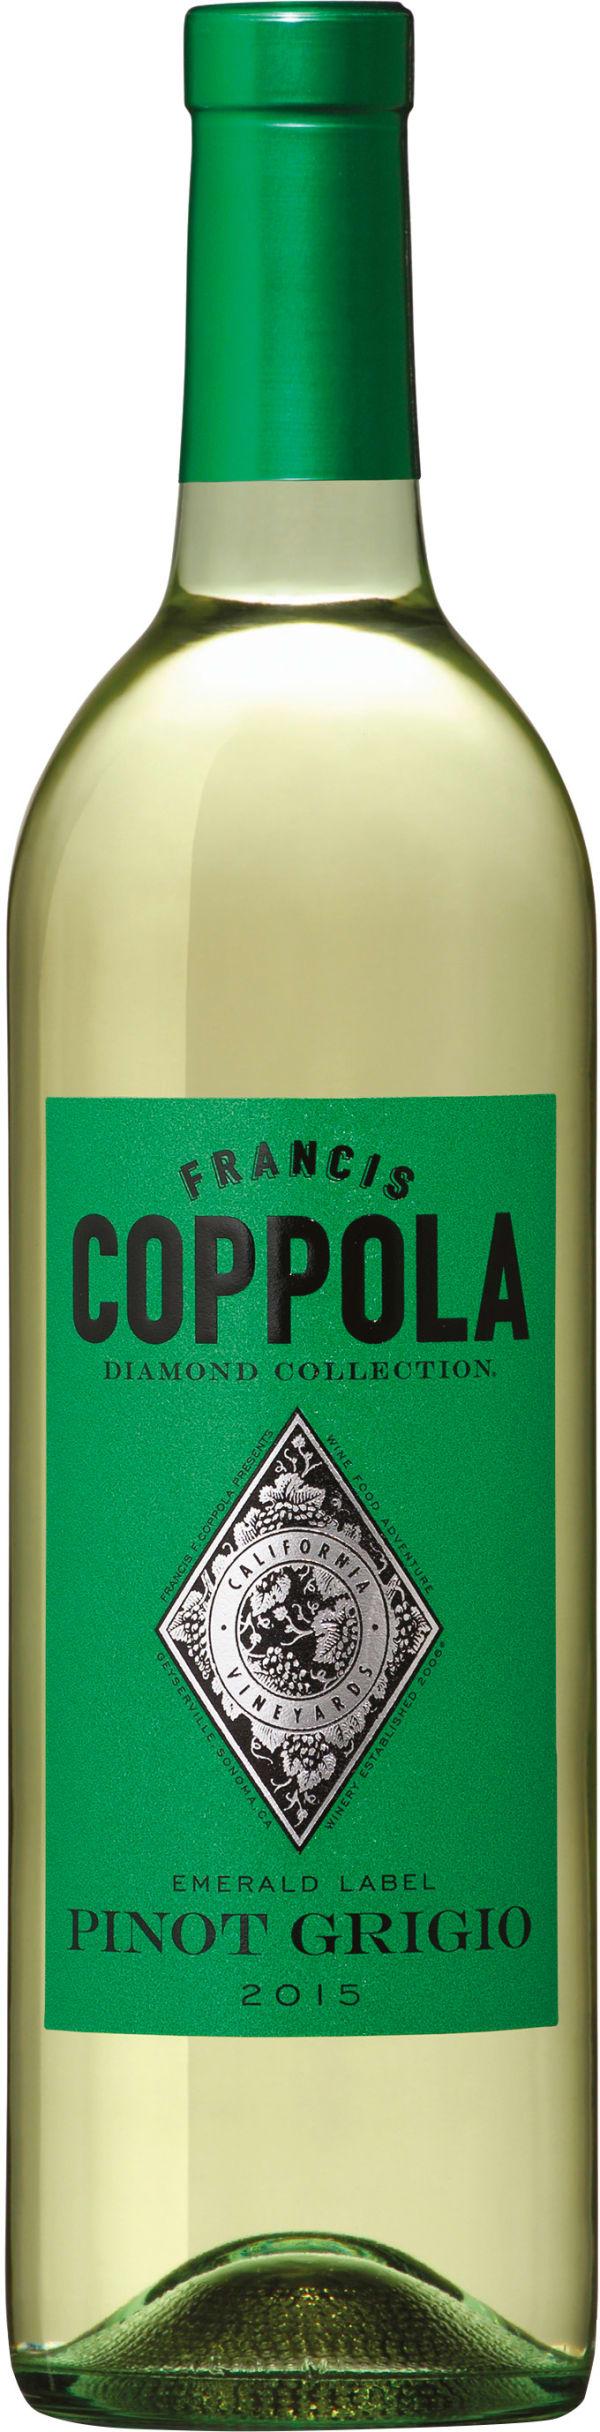 Coppola Diamond Collection Pinot Grigio 2017